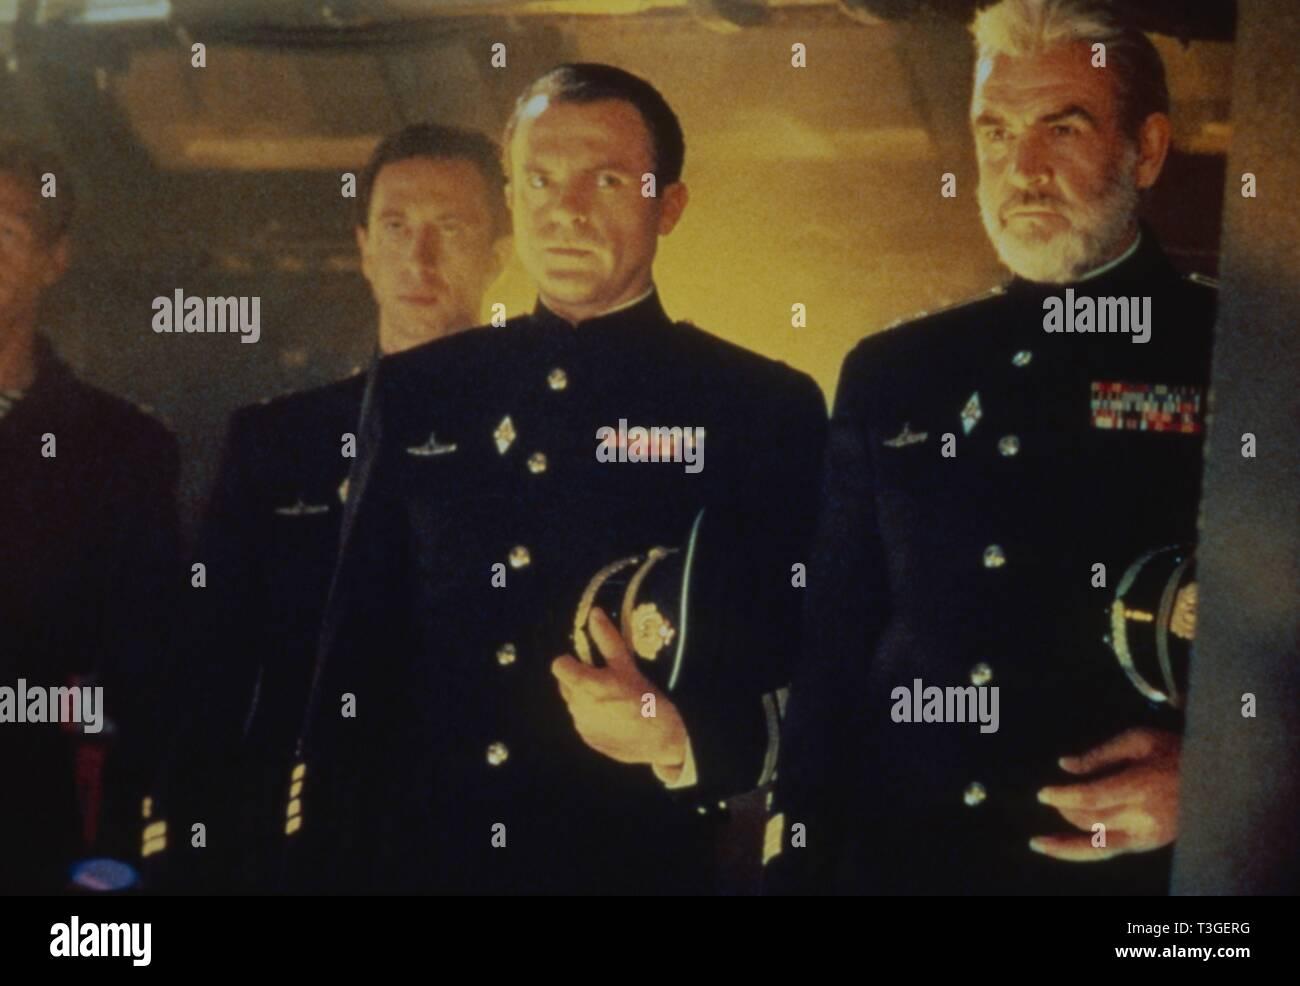 The Hunt for Red October  Year : 1990 USA Director : John McTiernan Scott Glenn, Sam Neill, Sean Connery - Stock Image